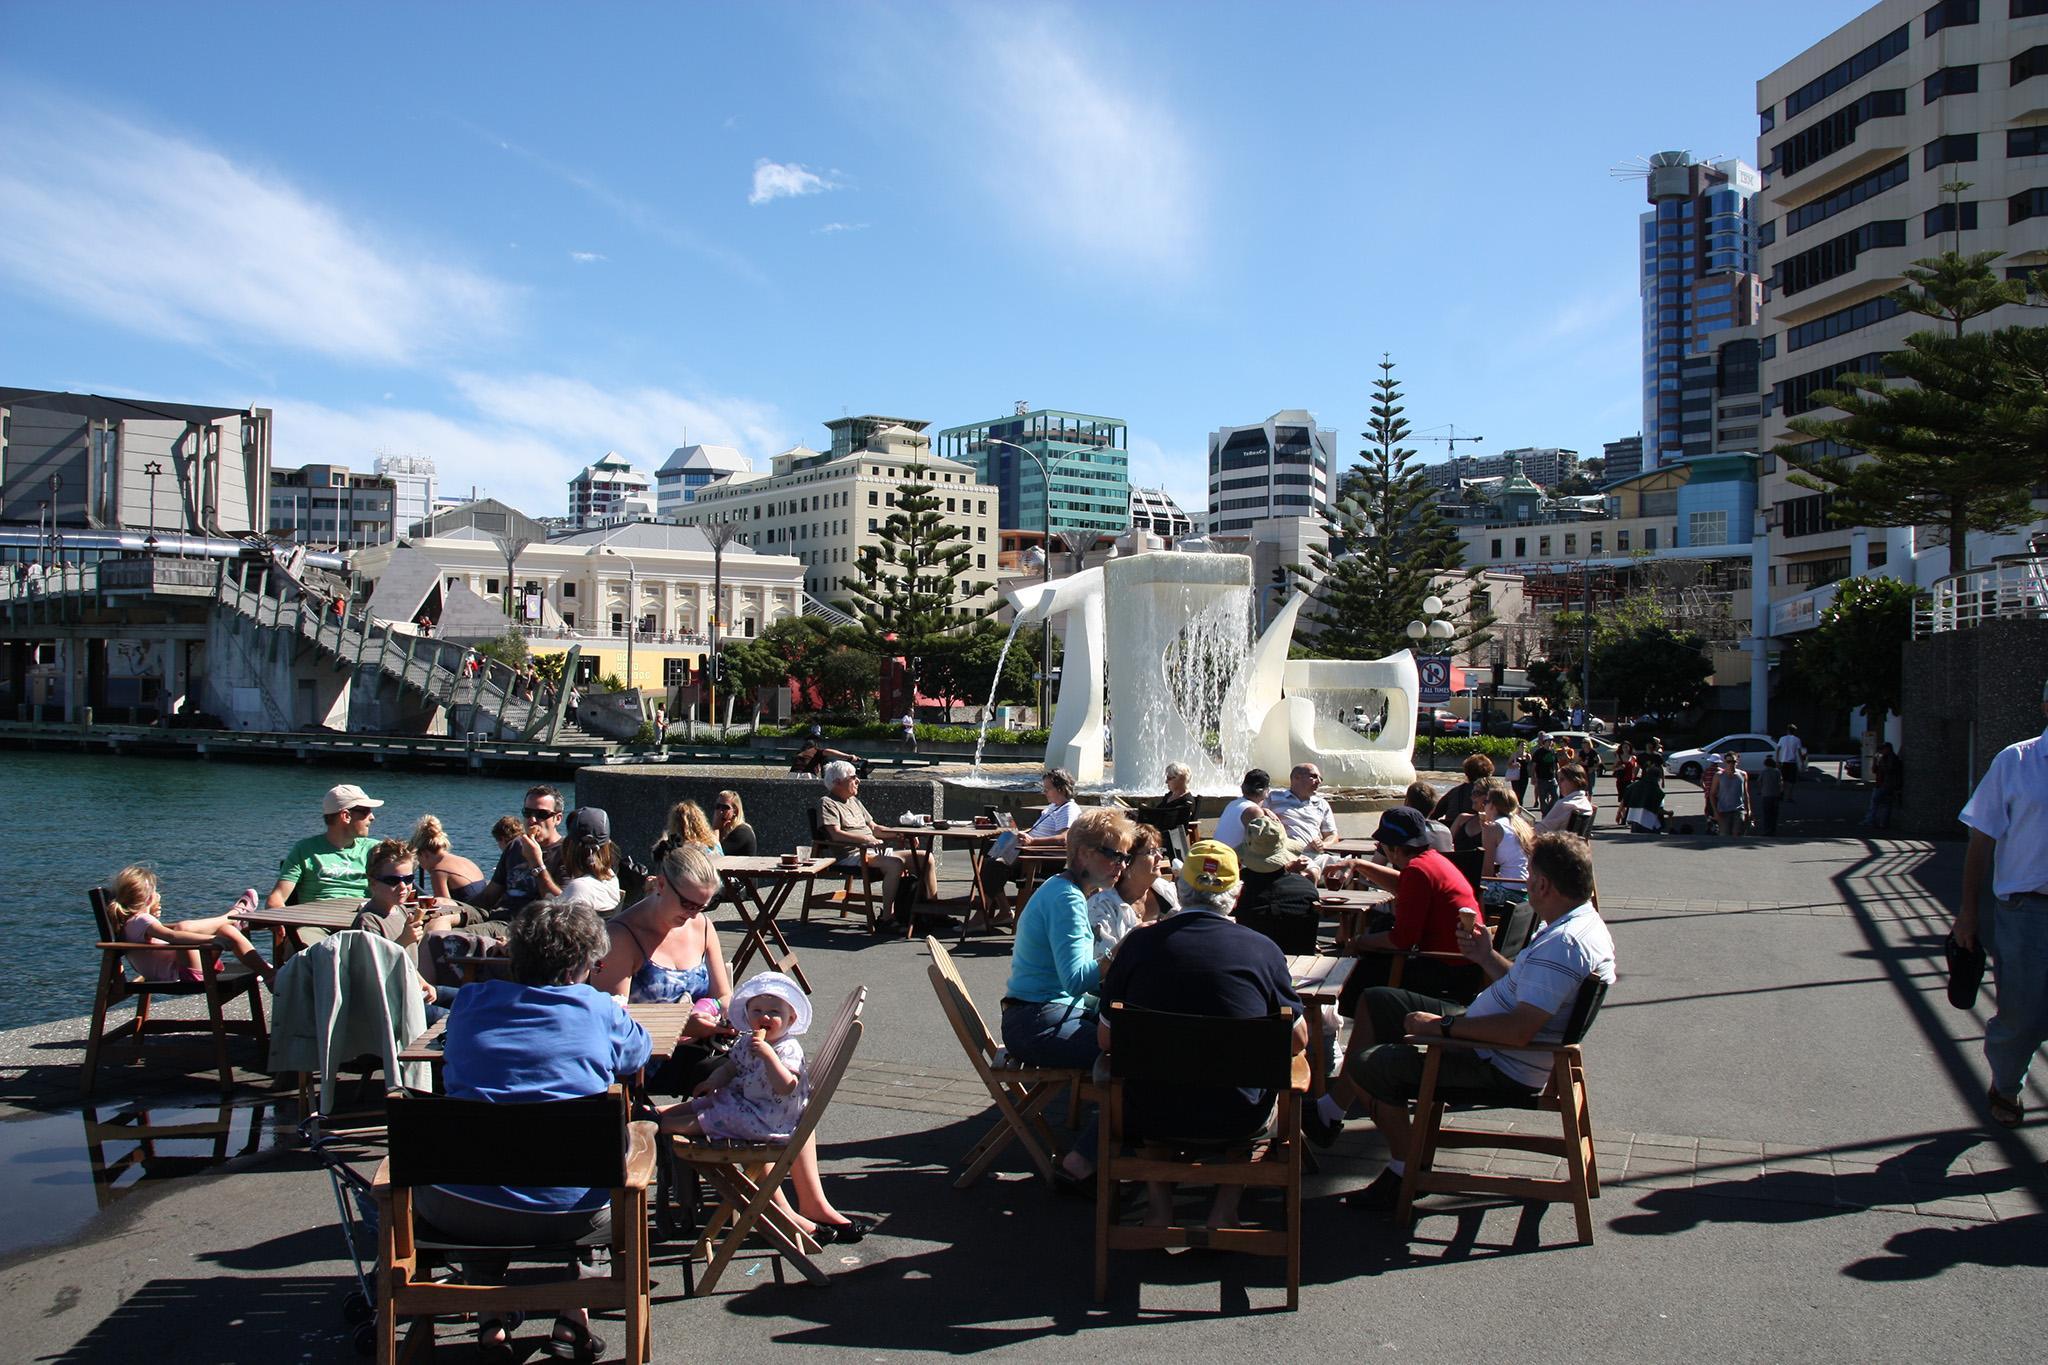 15. Wellington, New Zealand